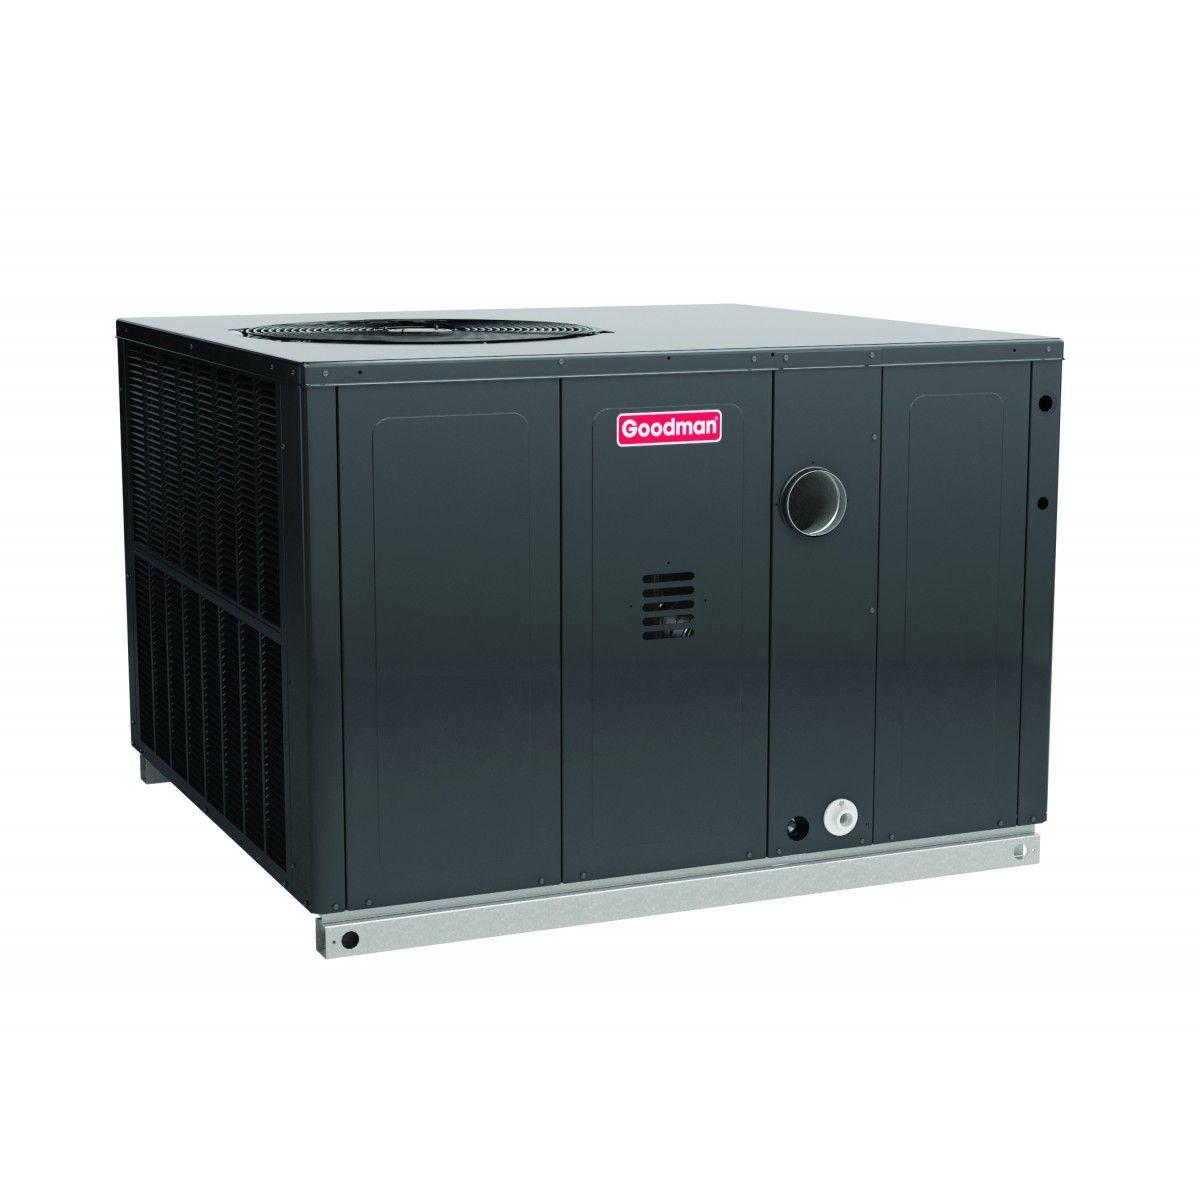 goodman 2 5 ton 14 seer 40k btu packge unit with gas heat. Black Bedroom Furniture Sets. Home Design Ideas